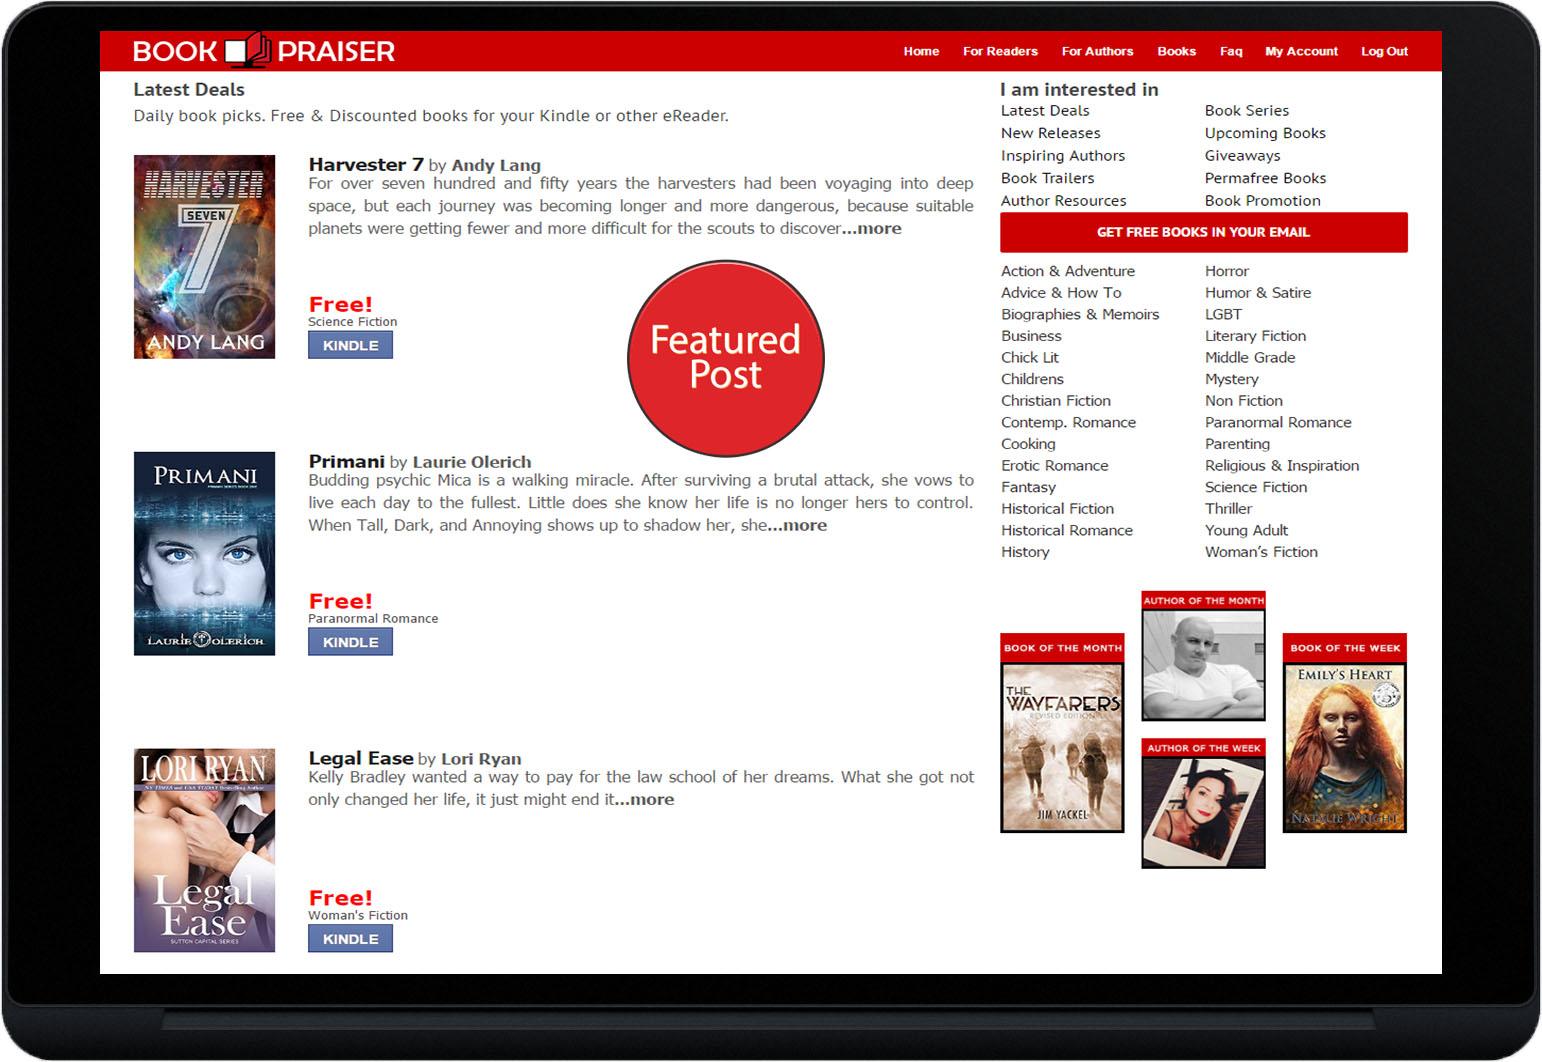 Free Book Promotion Plan - Bookpraiser